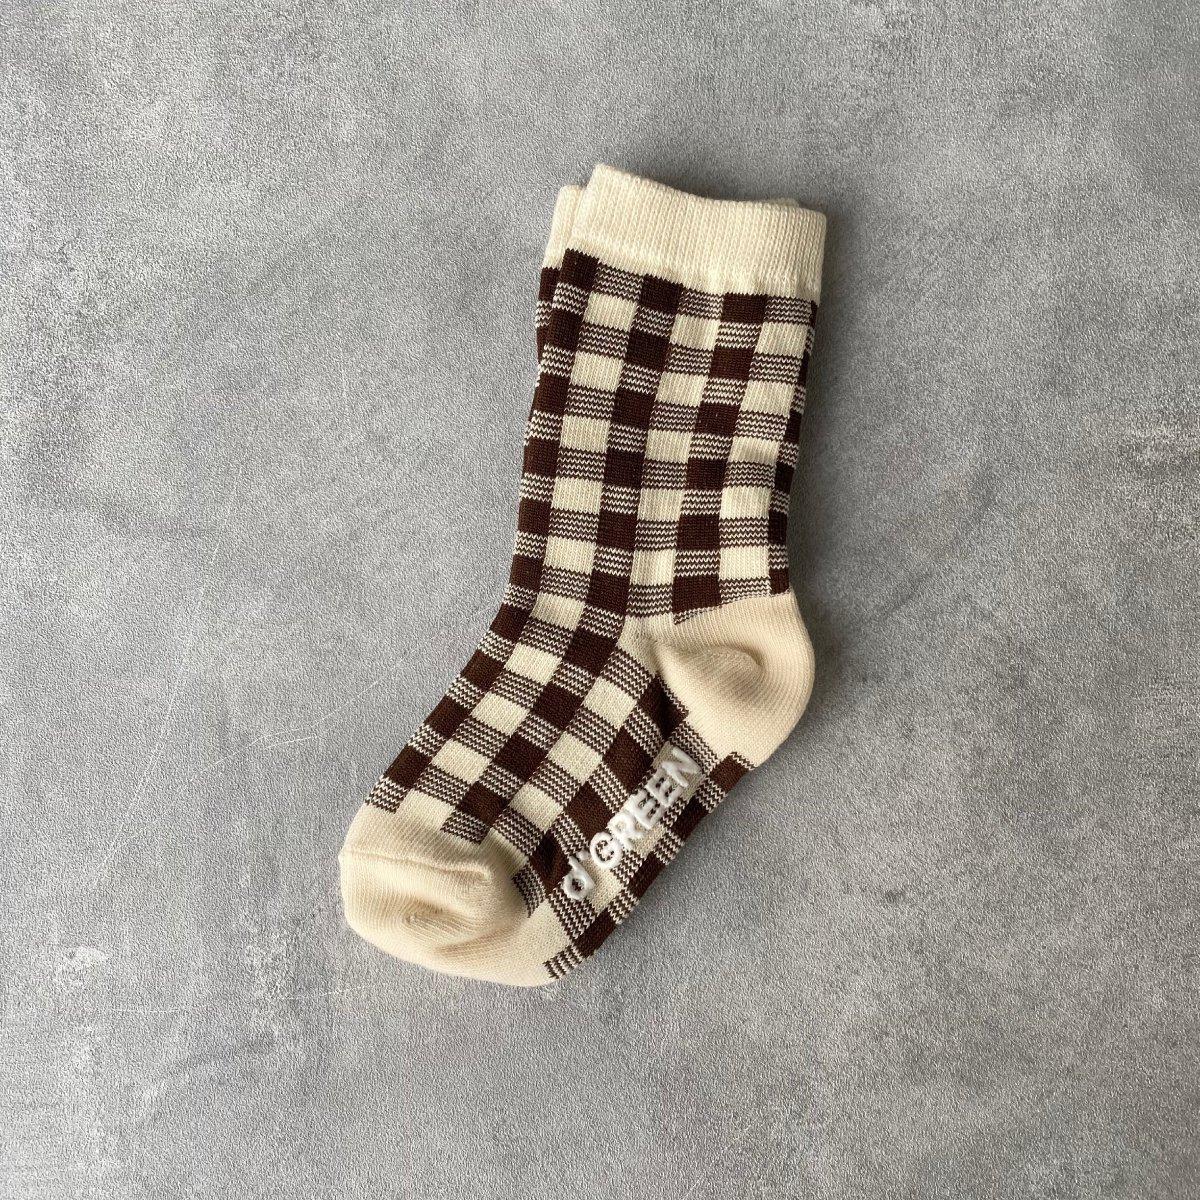 【BABY】Natural Check Socks 詳細画像5